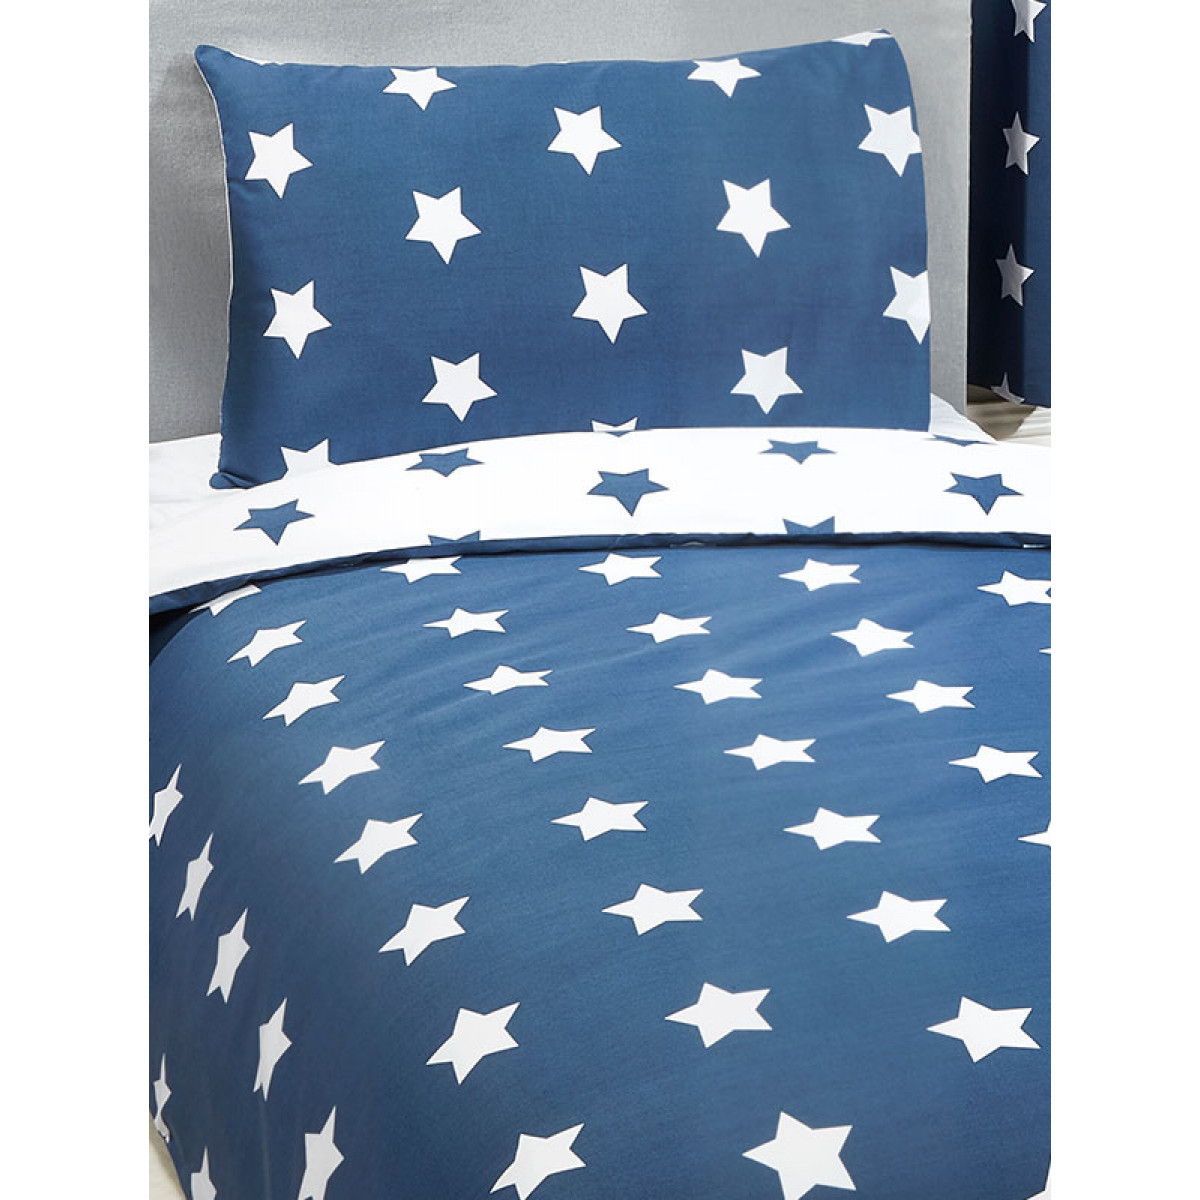 Navy Blue And White Stars Junior Duvet Cover And Pillowcase Set Bedding